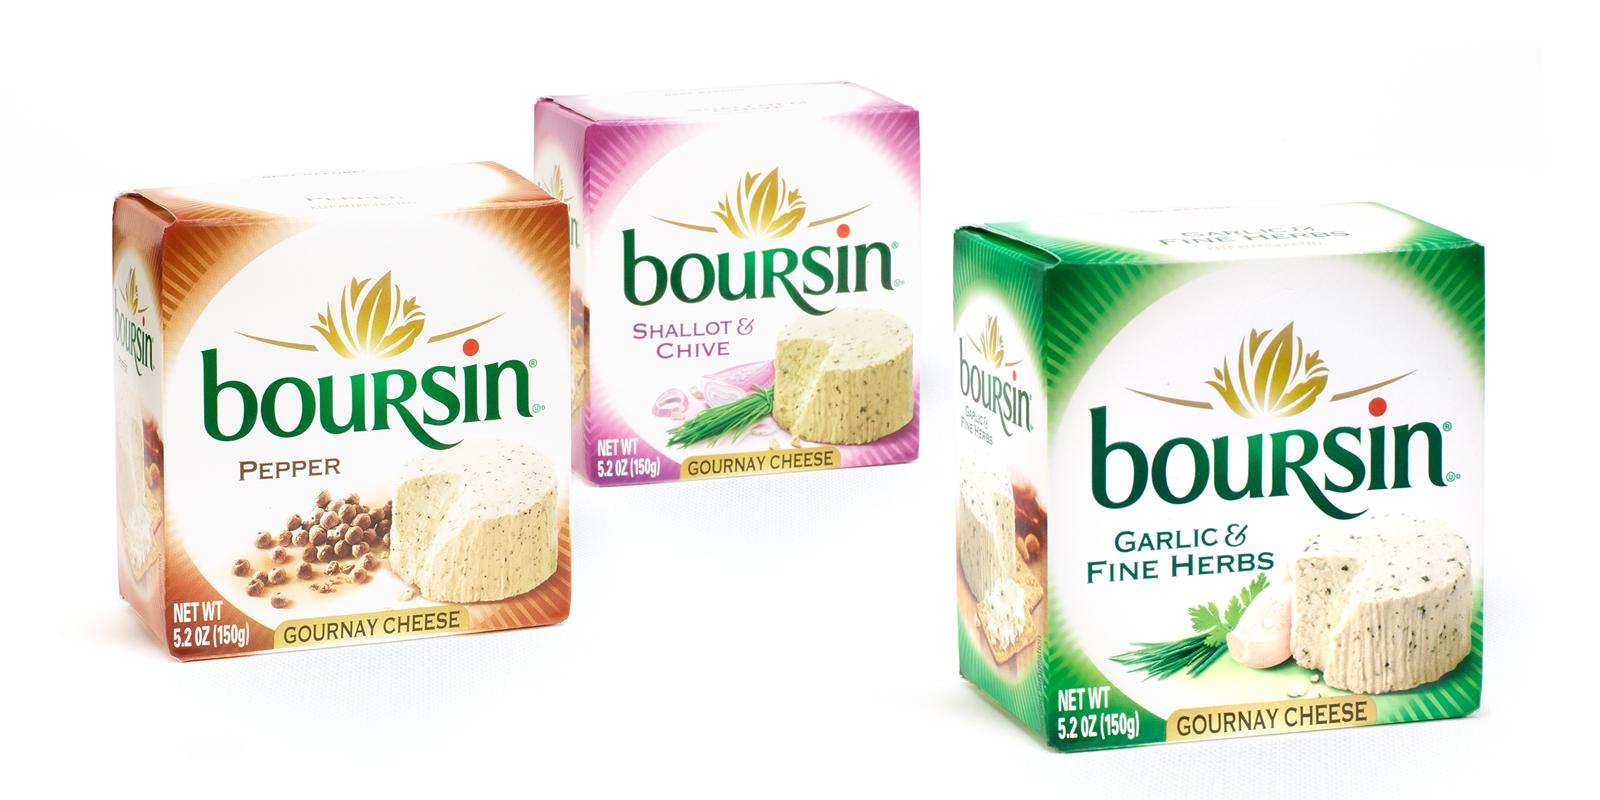 boursin-packaging.jpg